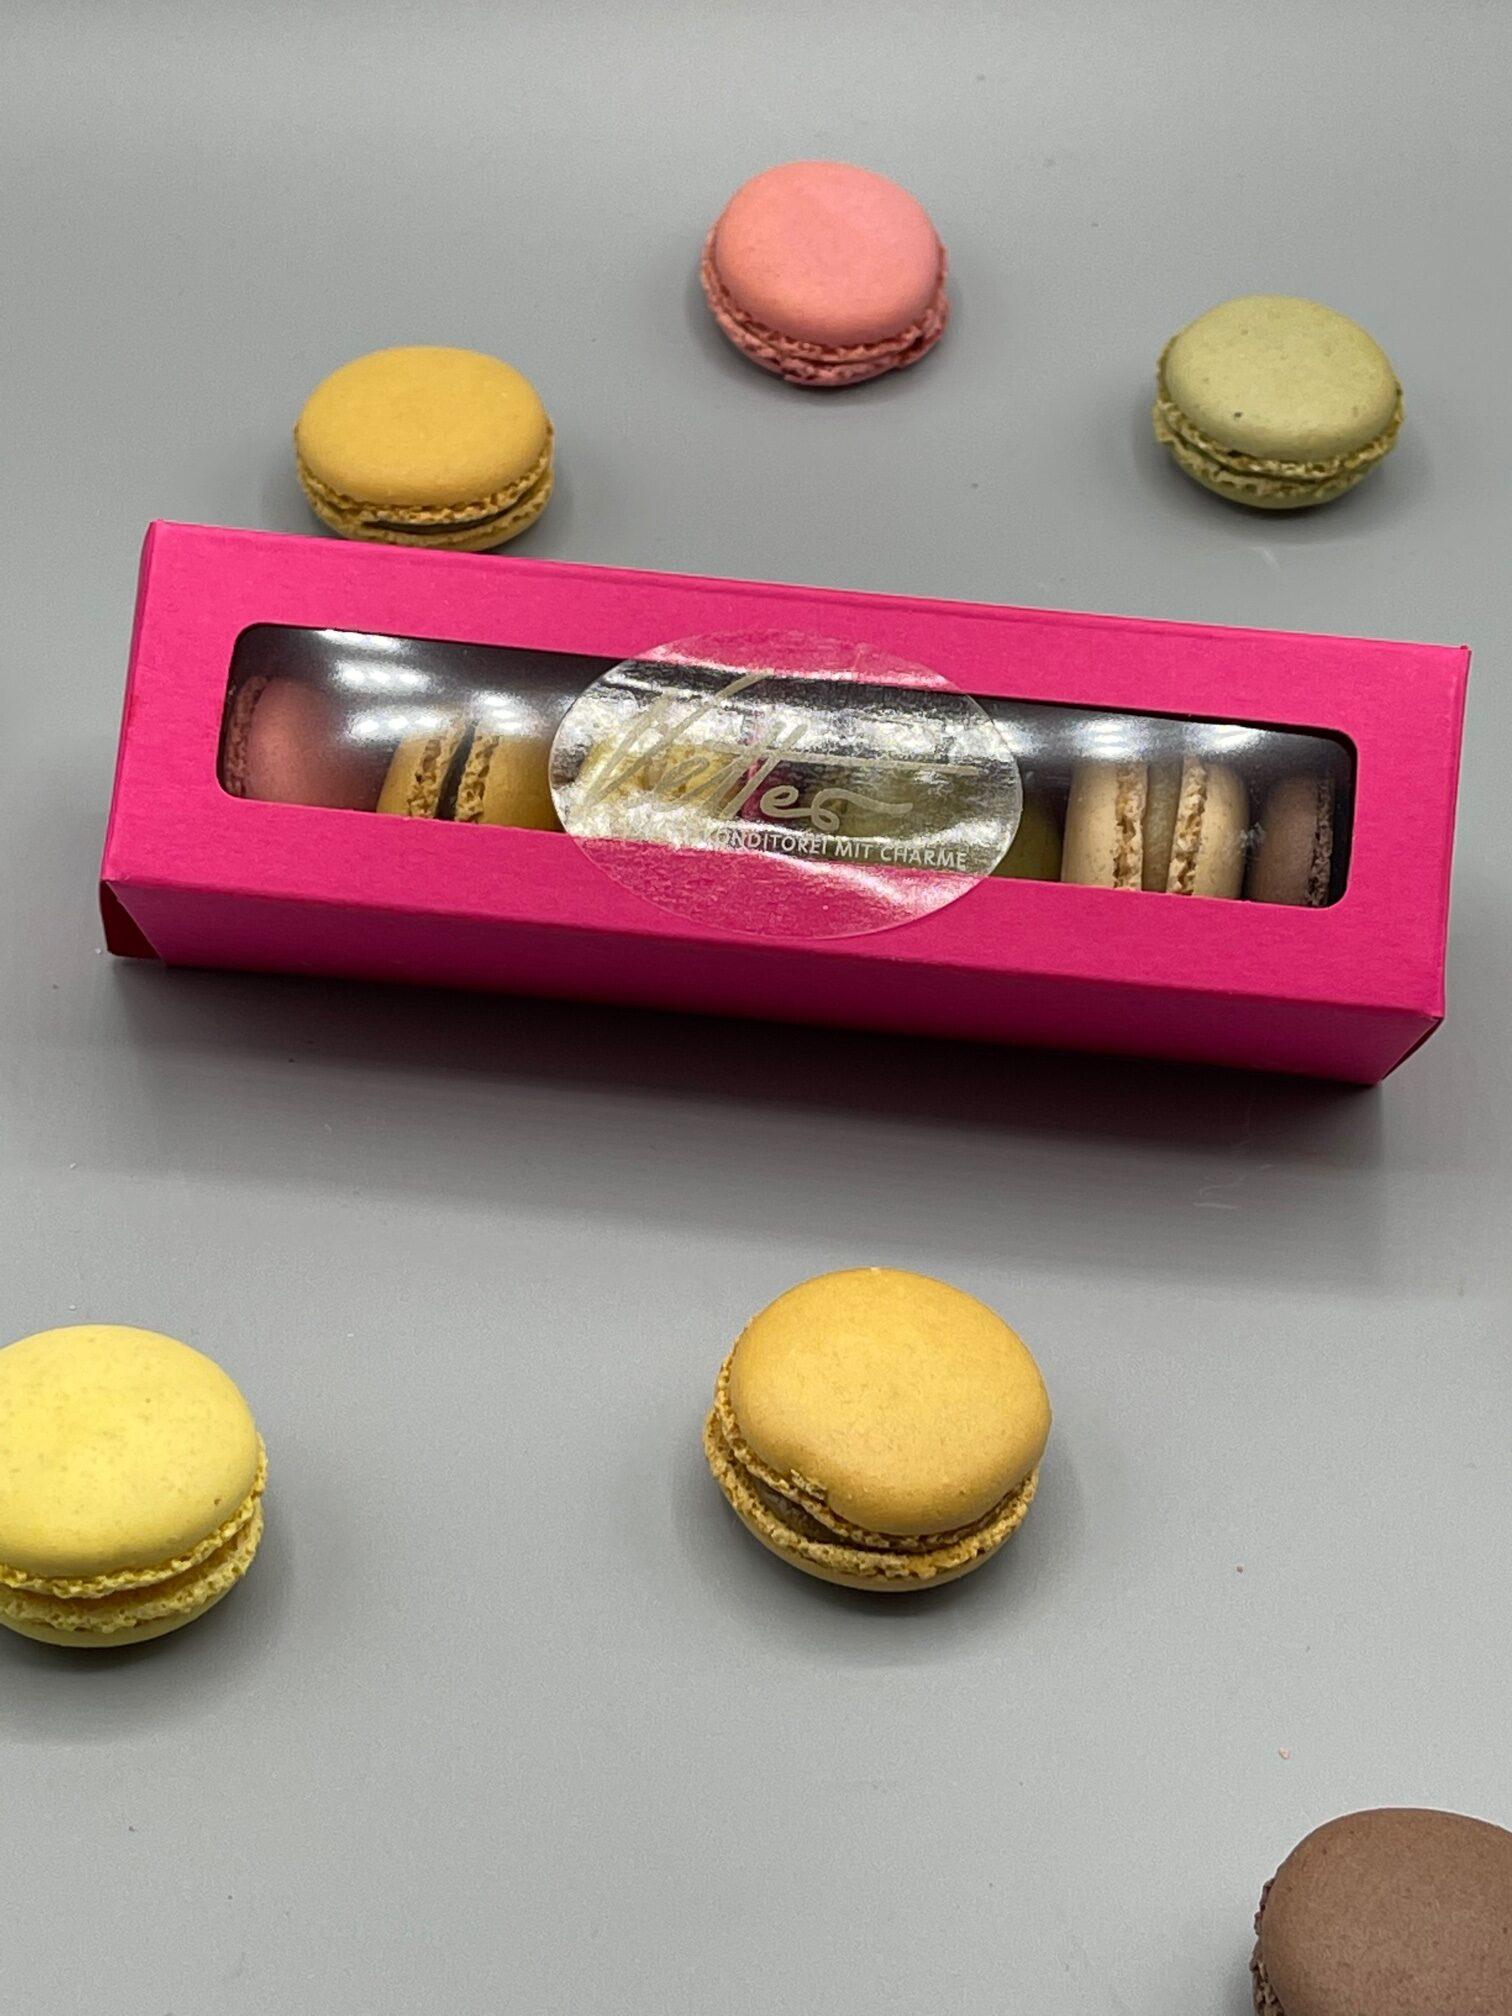 Feinste Macarons In Wunderschöner Präsentverpackung 6 Stück